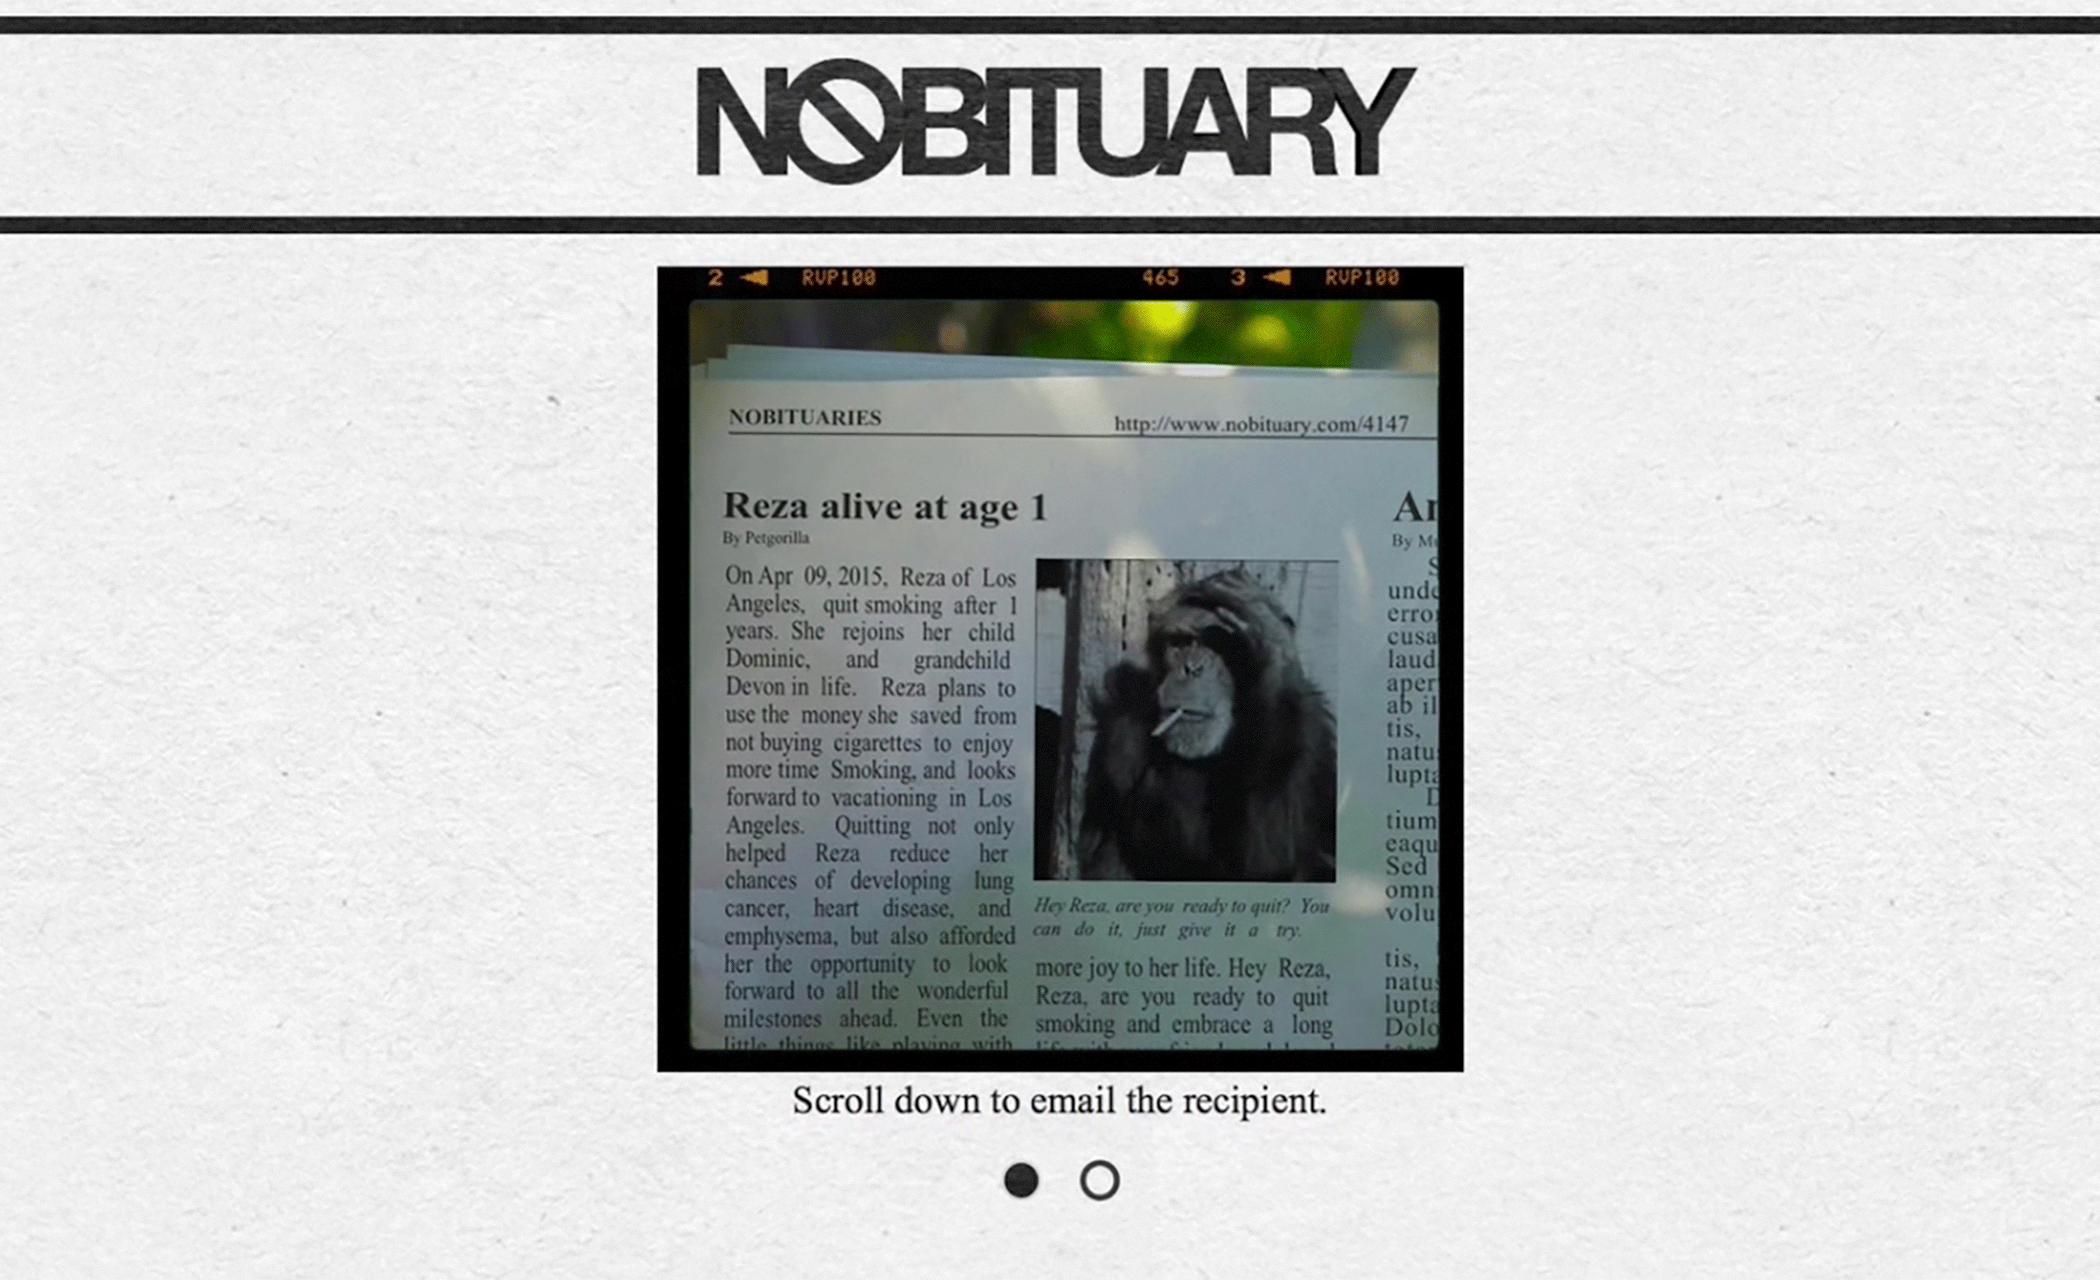 Nobituary